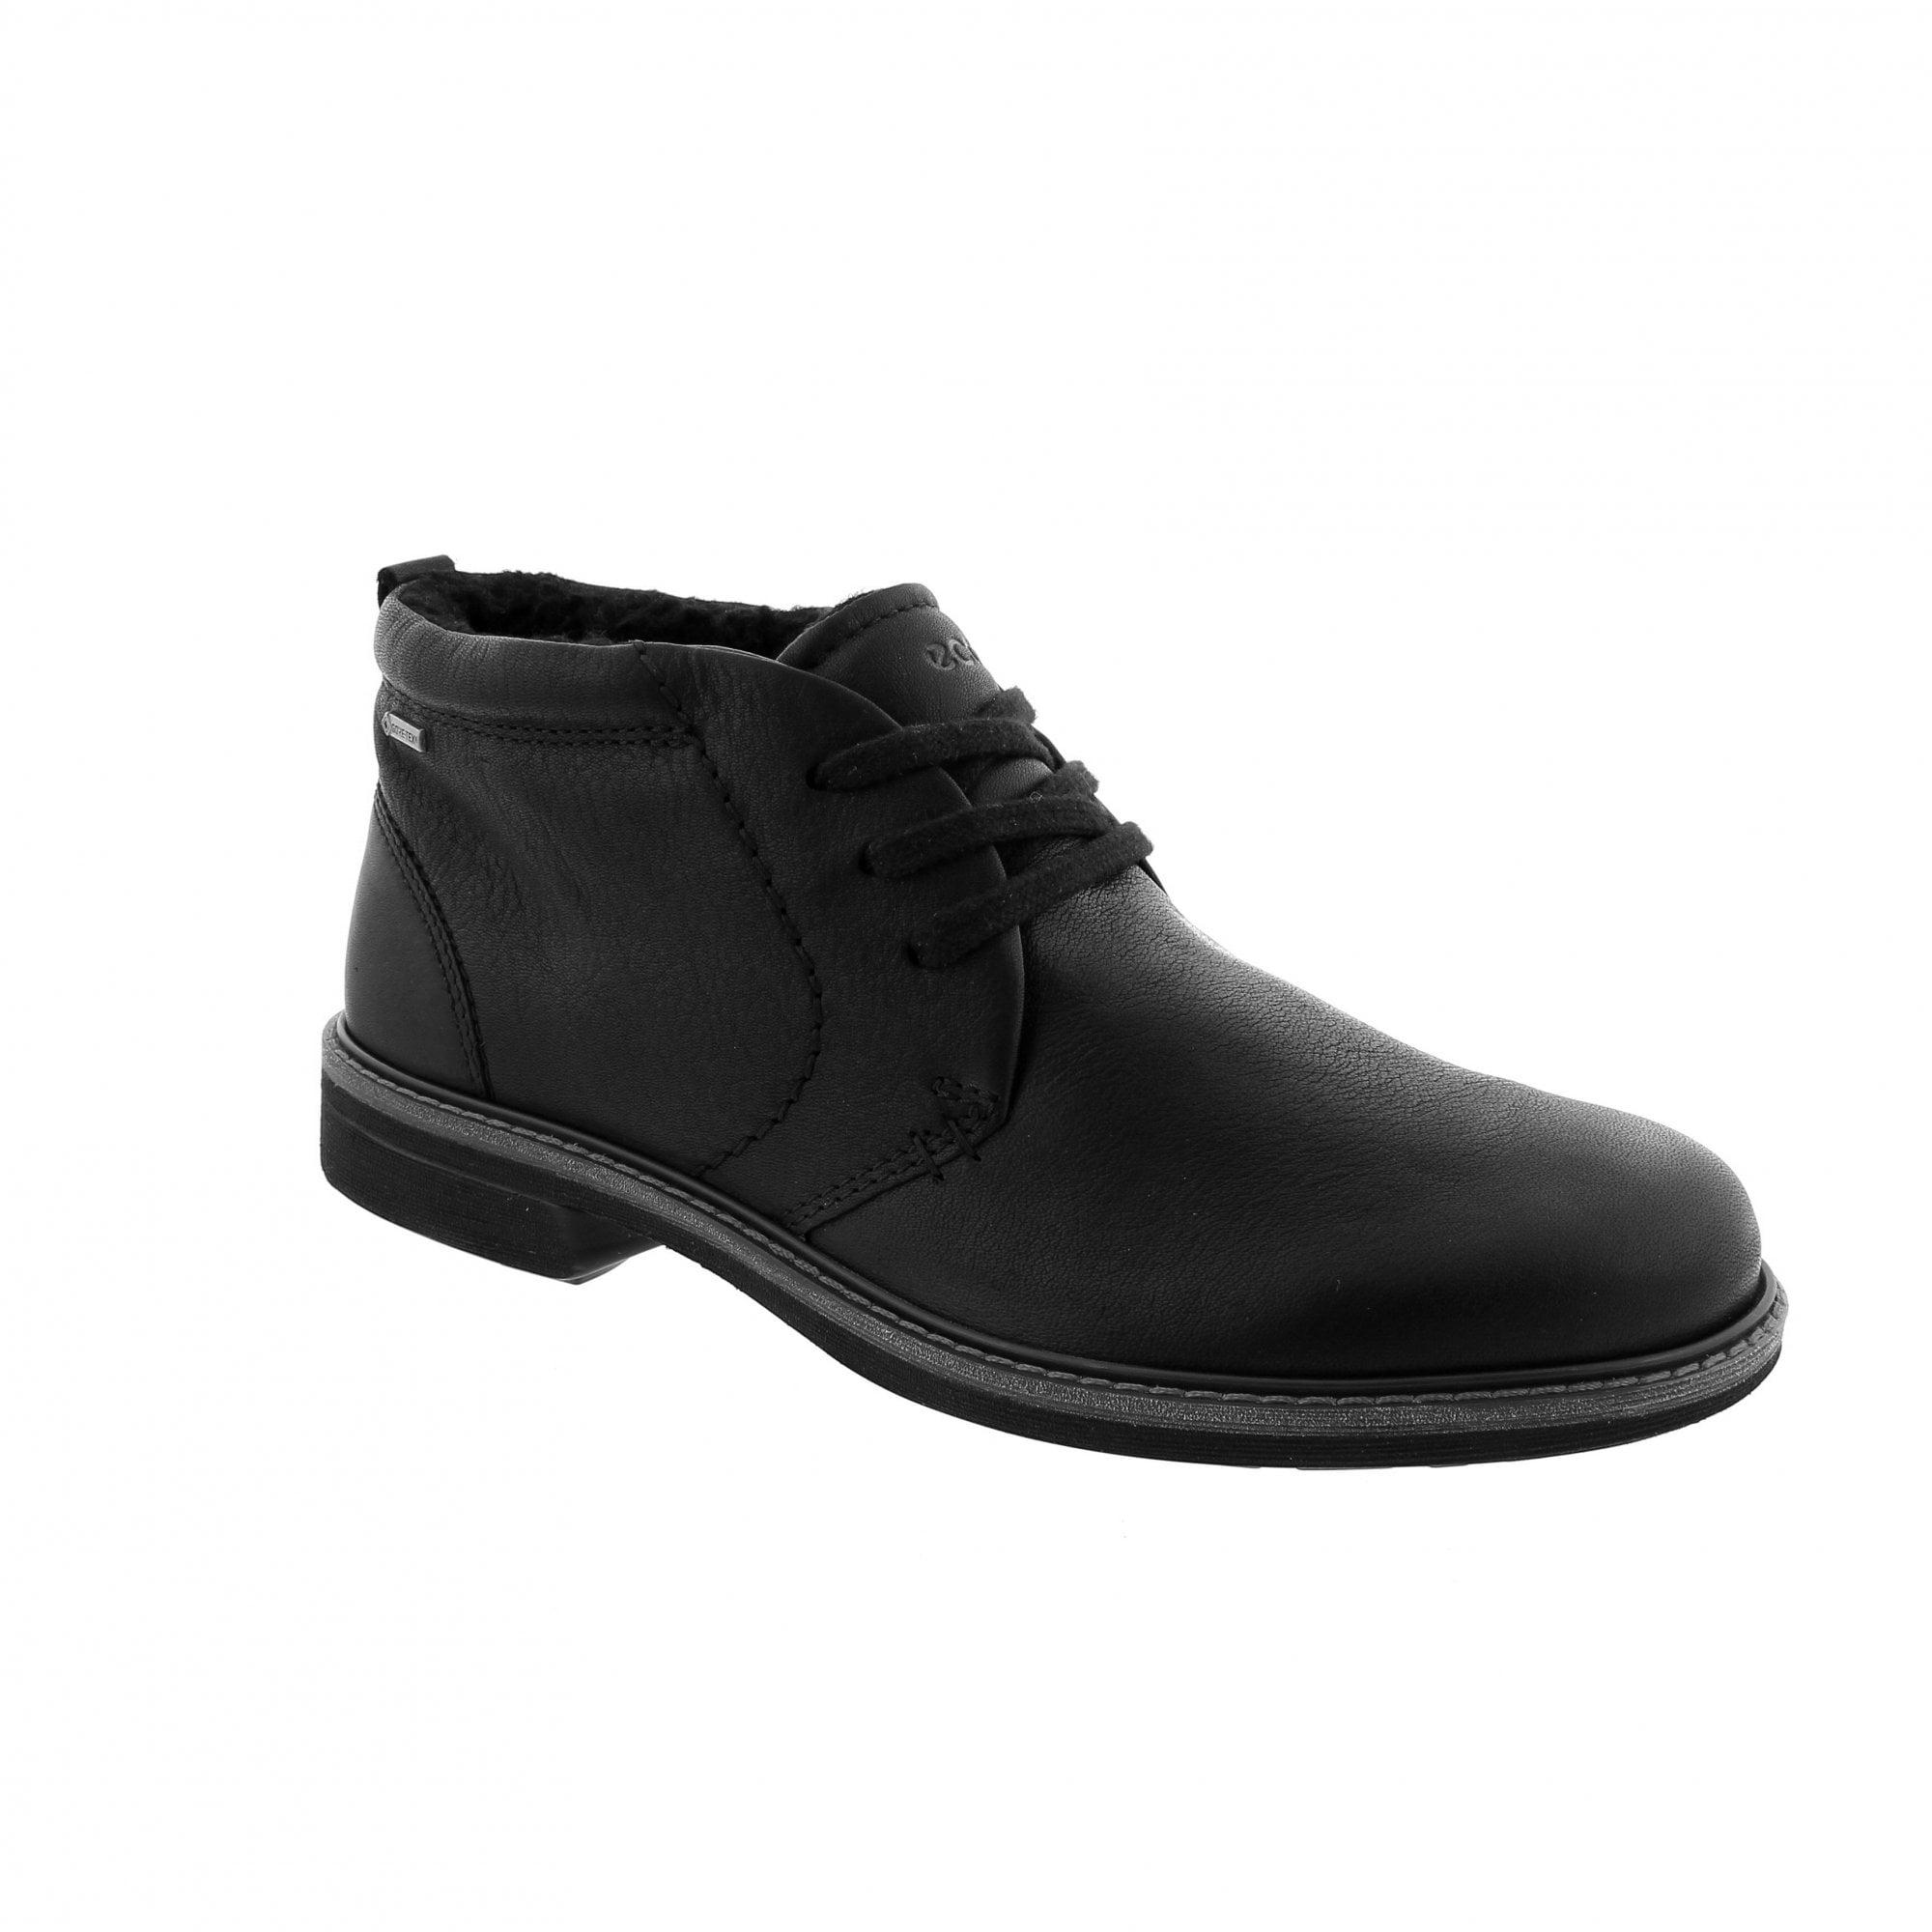 ecco turn shoes